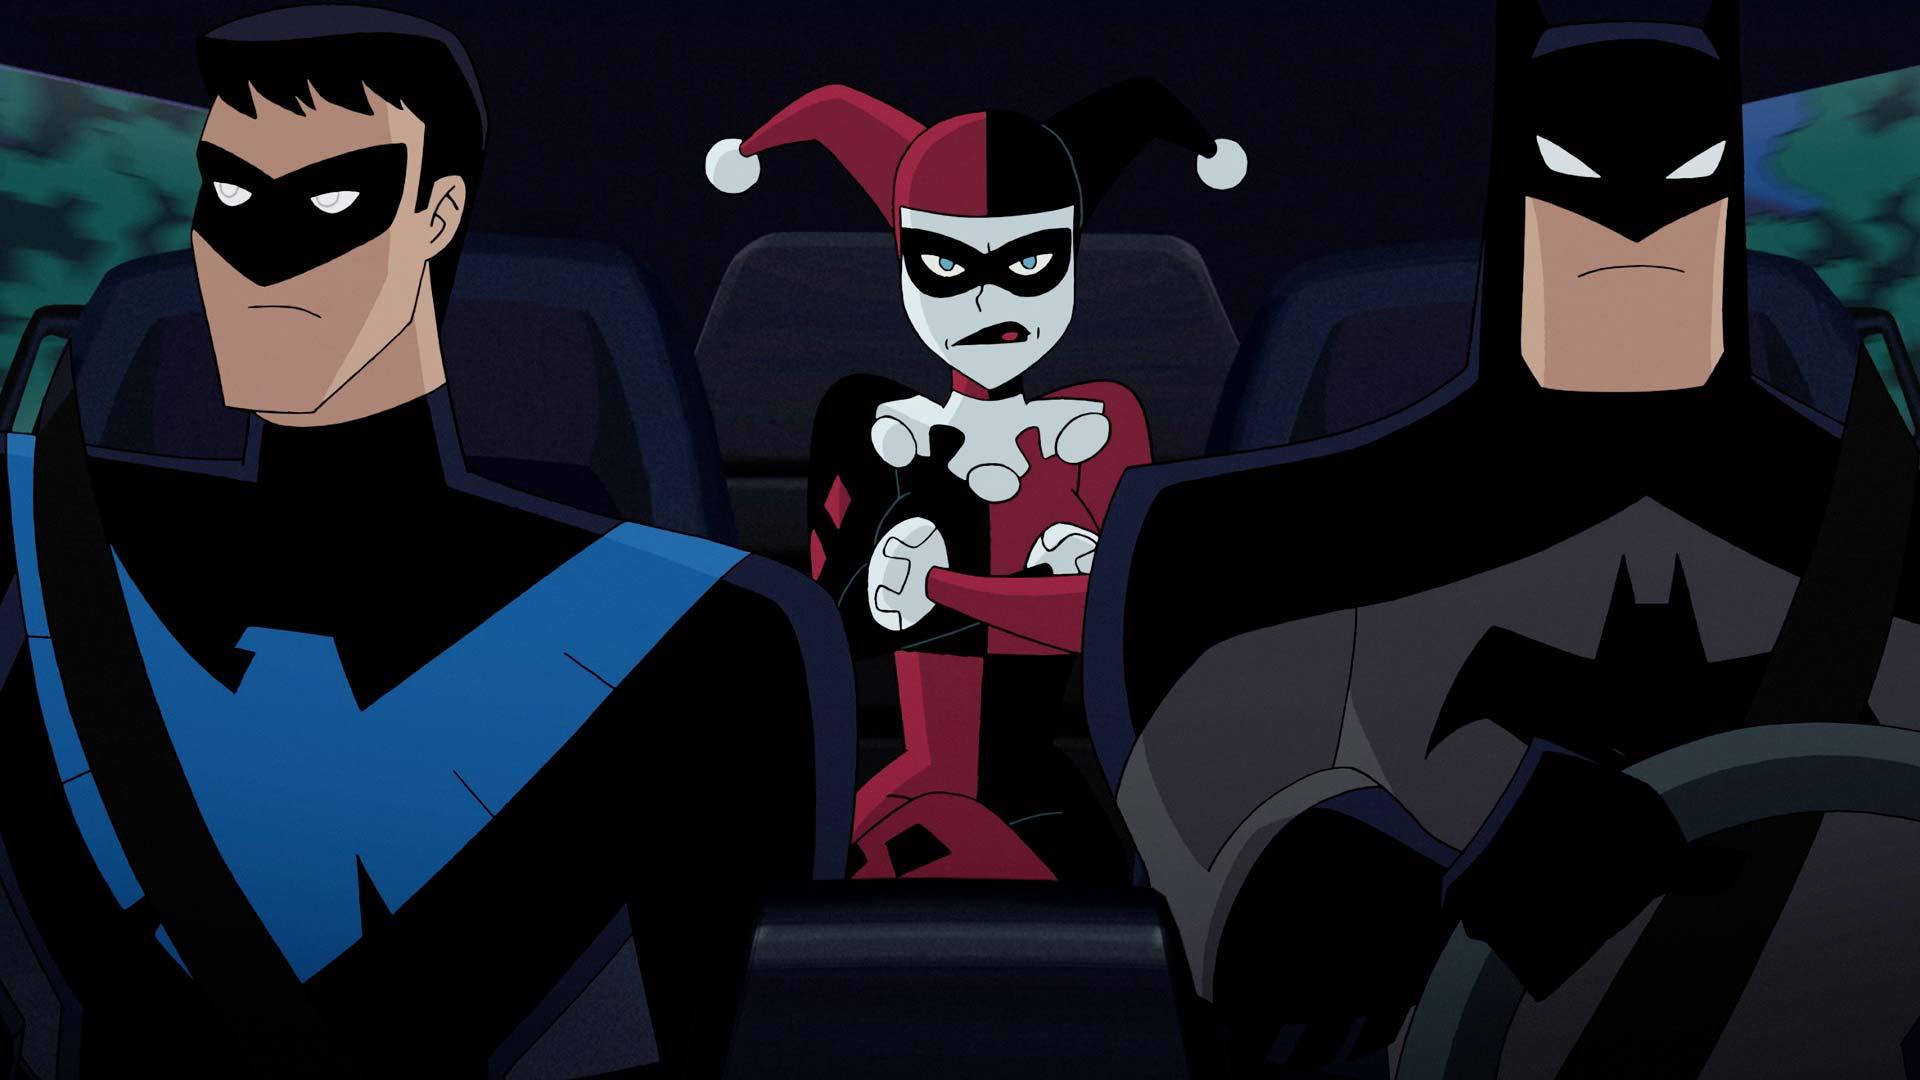 Smells Like Discipline Batman And Harley Quinn 2017 Cultural